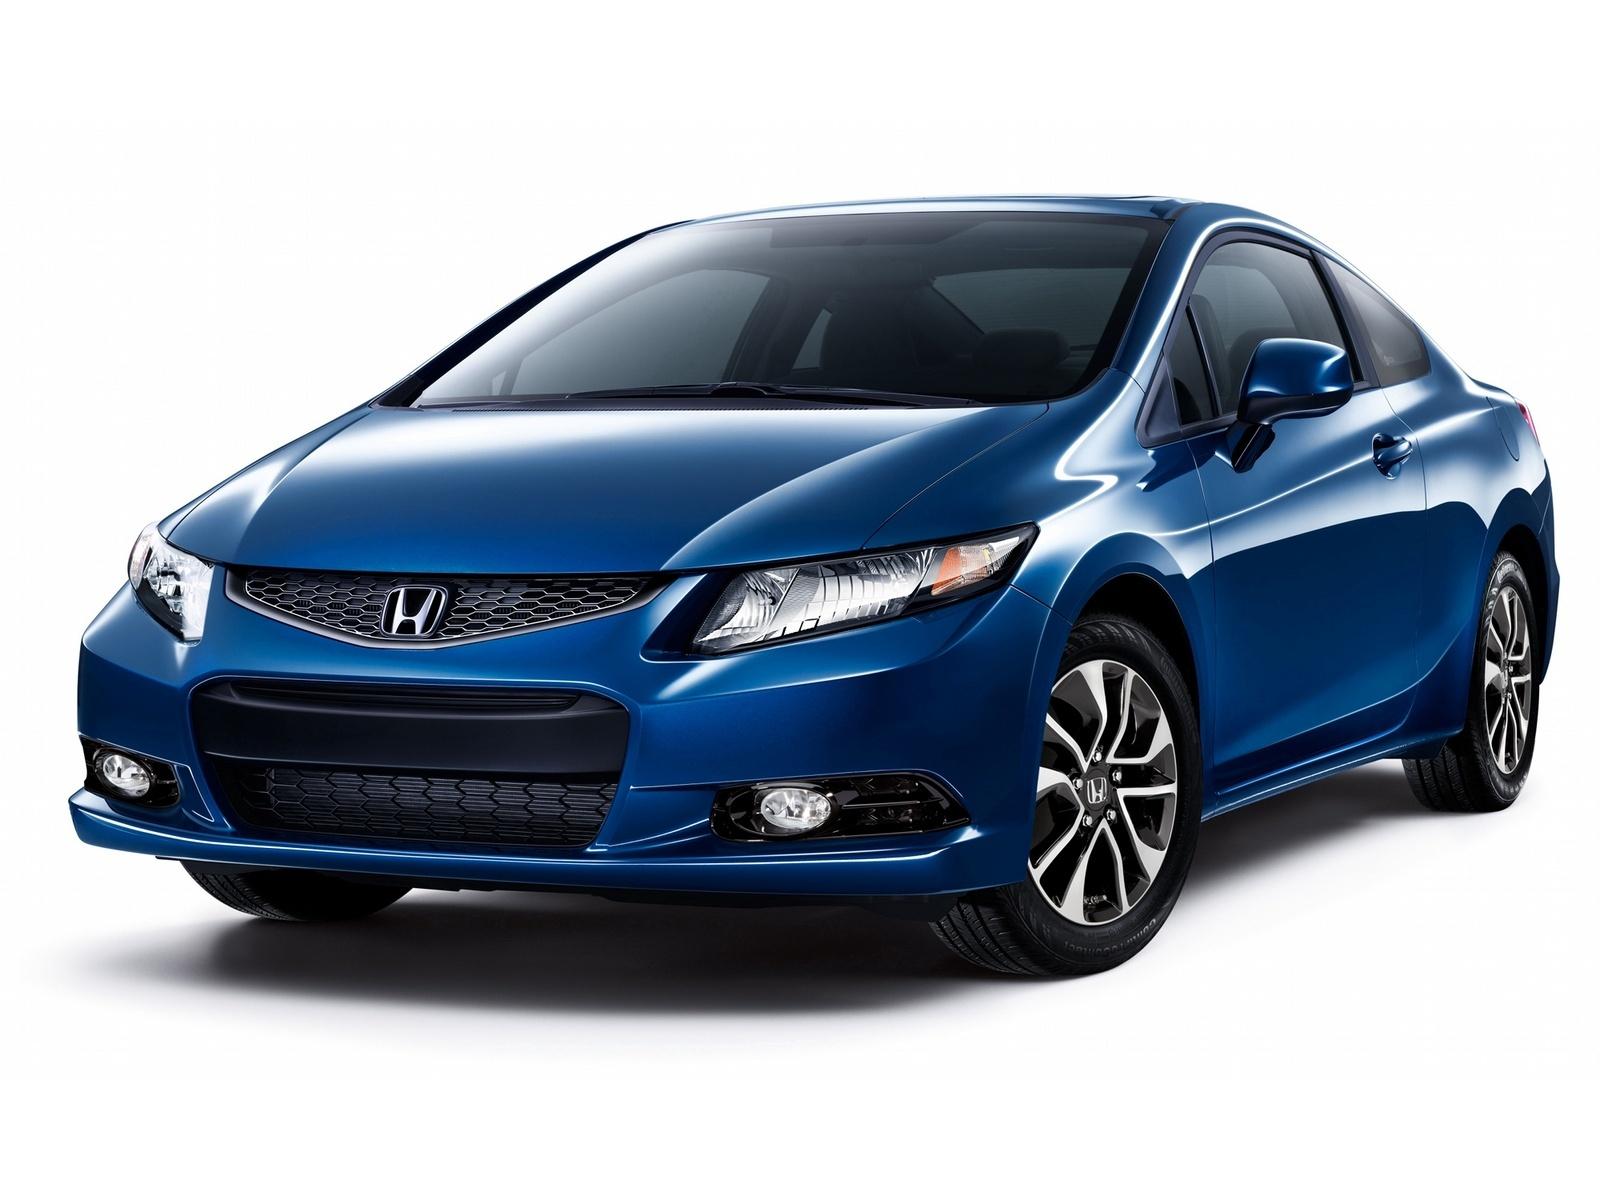 2013 Honda Civic Coupe  Overview  CarGurus